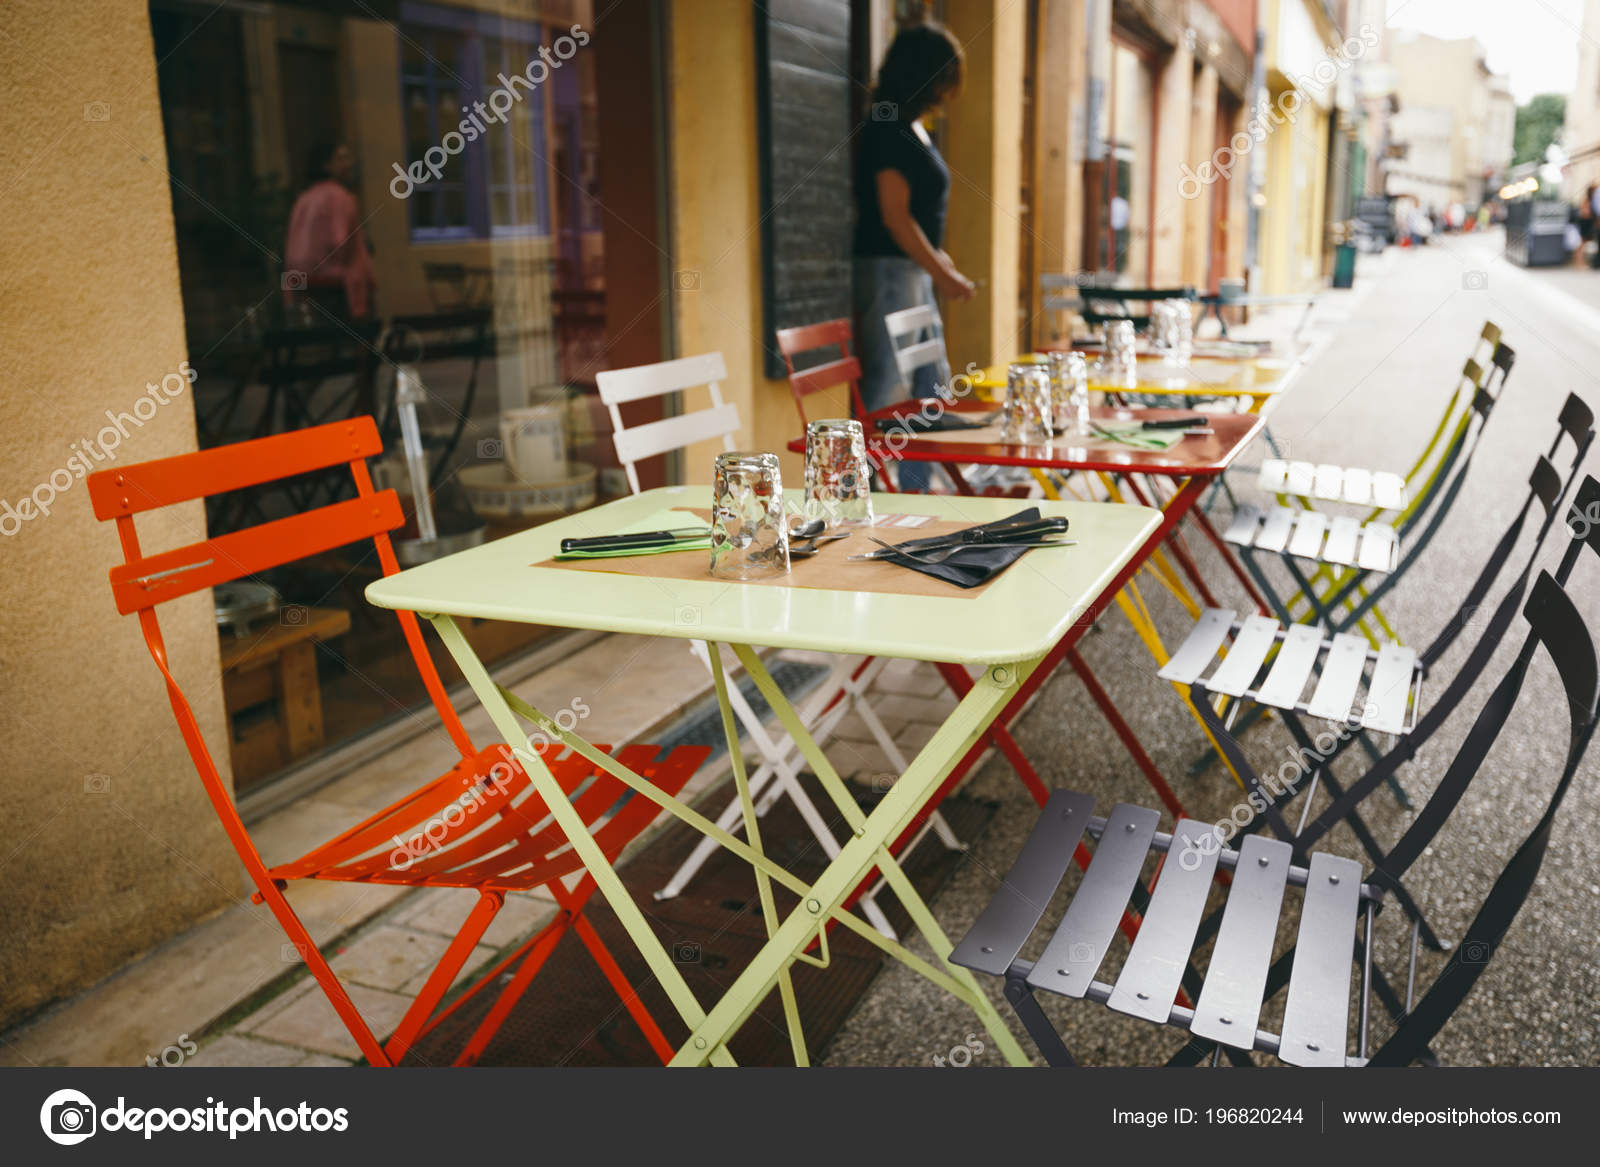 Theme Cafes Restaurants Exterior Summer Terrace Bright Colors Street Cafe Stock Photo C Veloliza 196820244